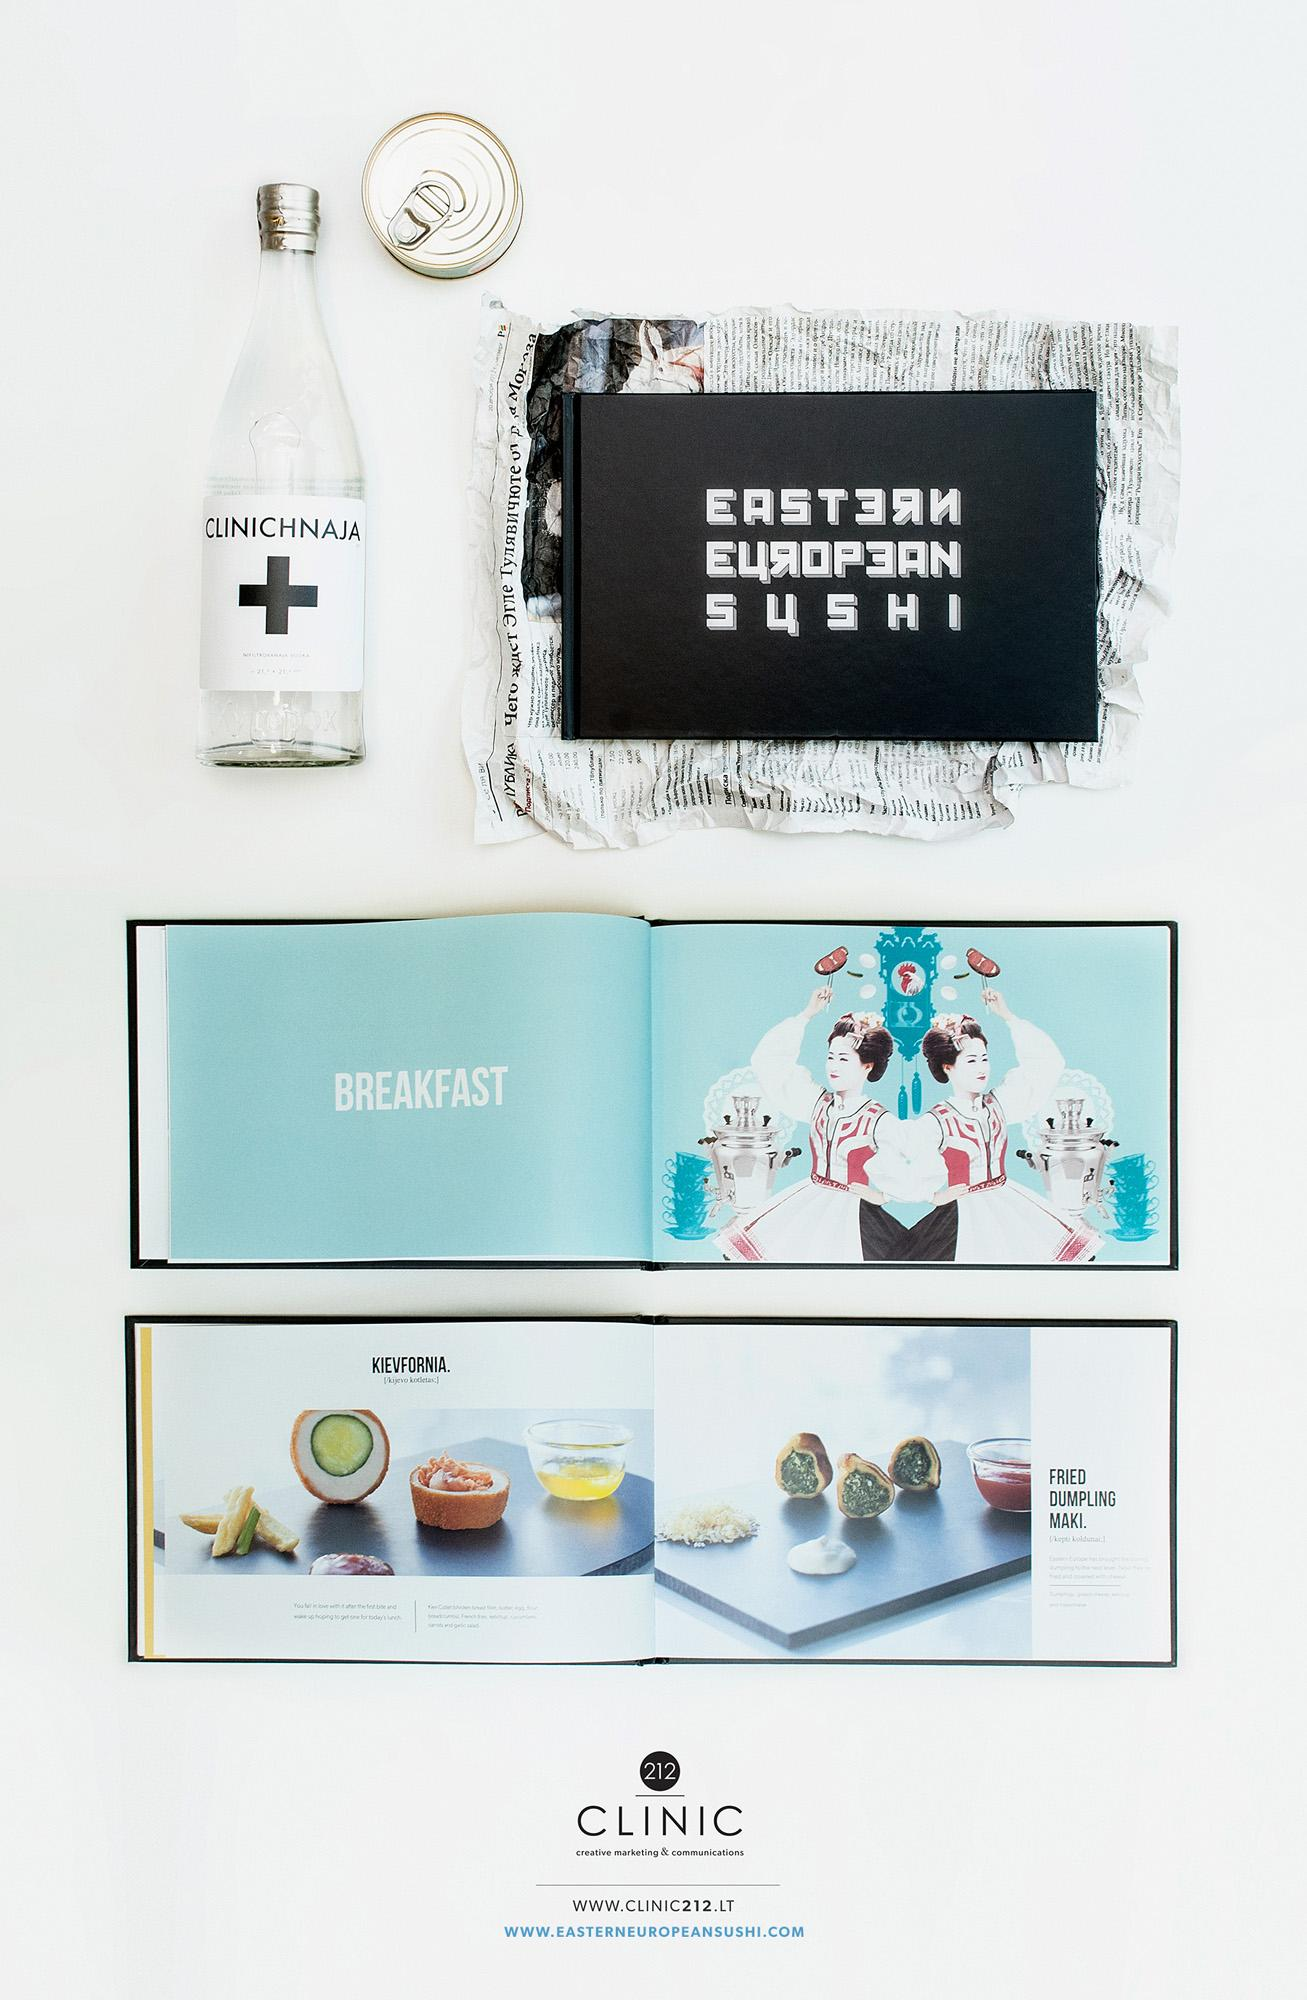 CLINIC 212 Print Ad -  Eastern European Sushi